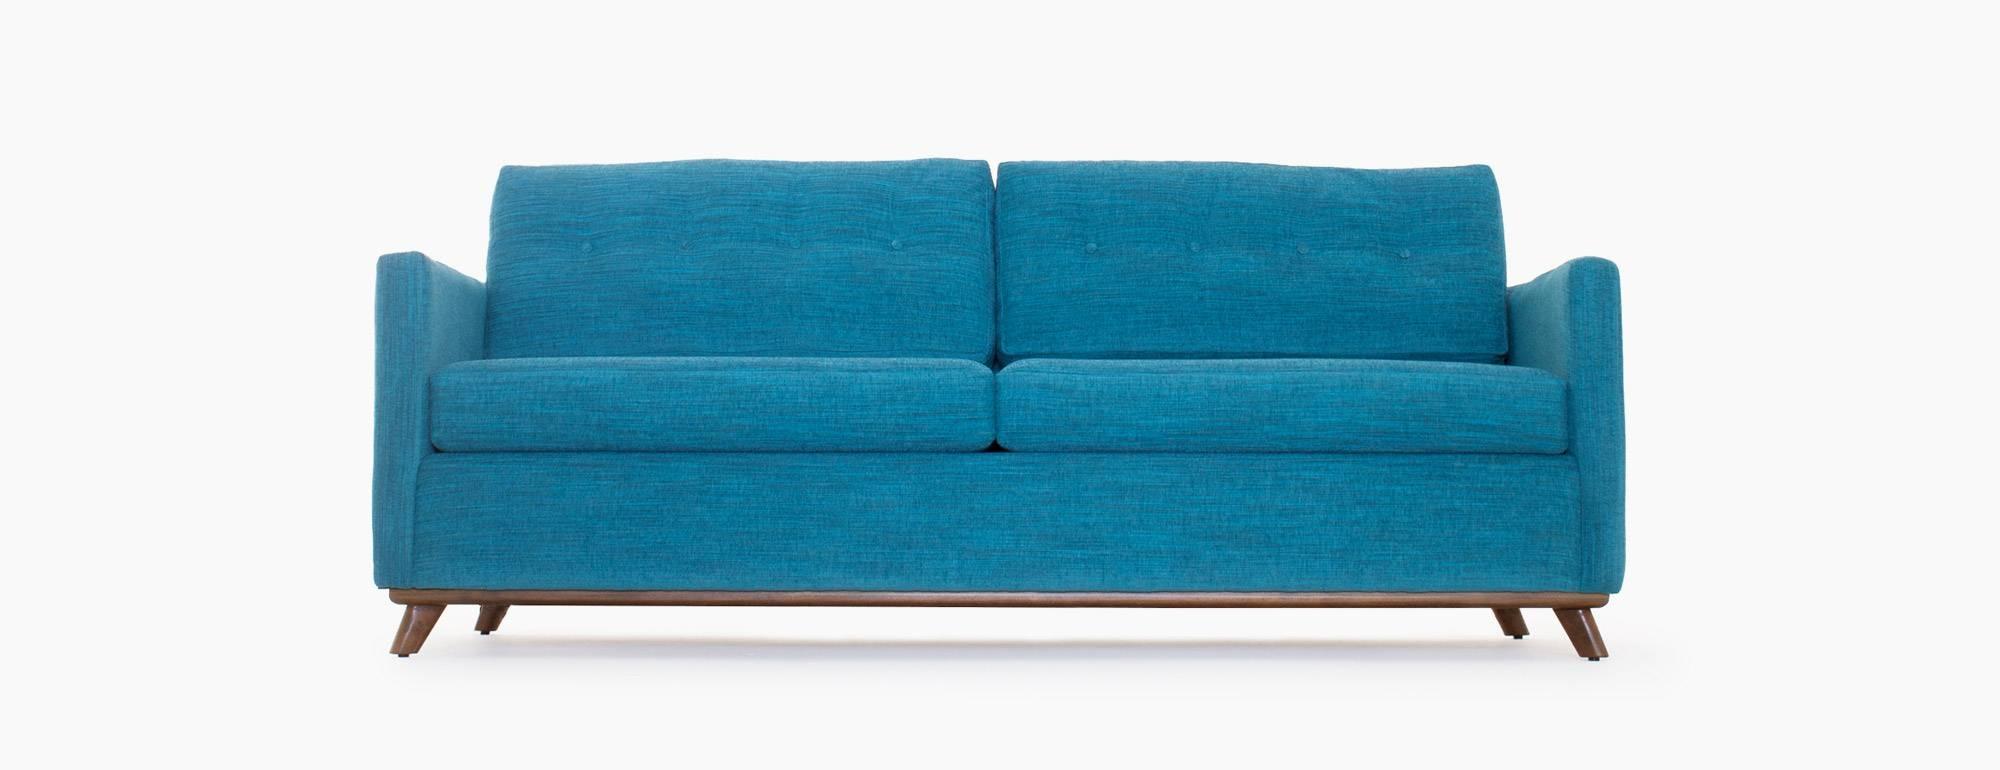 Hopson Sleeper Sofa | Joybird regarding Aqua Sofa Beds (Image 22 of 30)